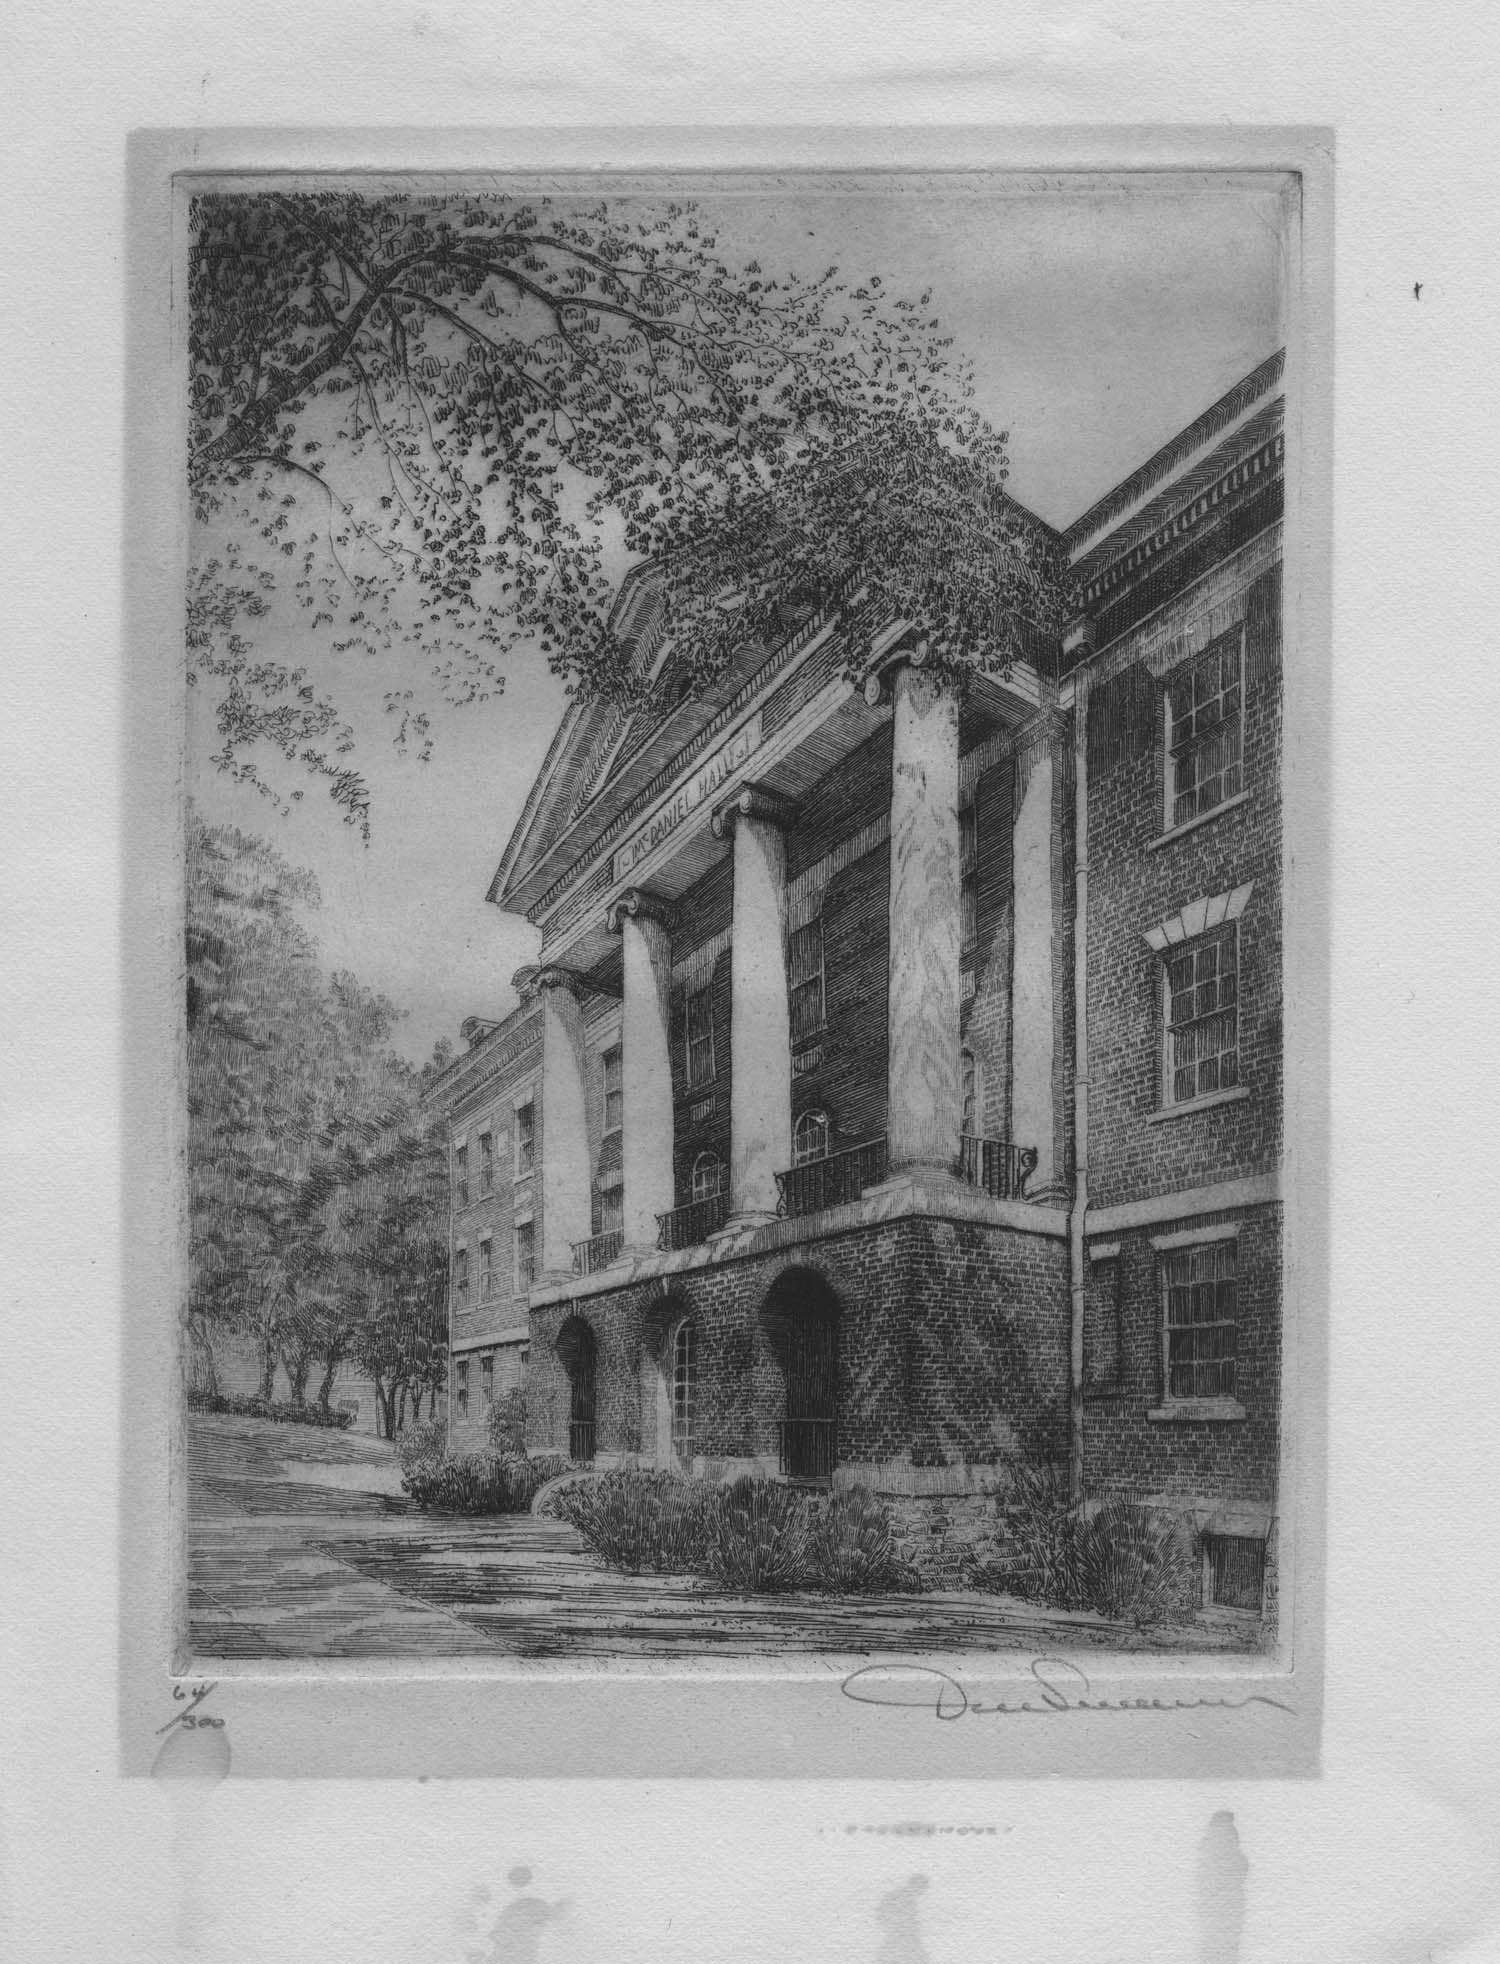 McDaniel Hall by Don Swann circa 1936